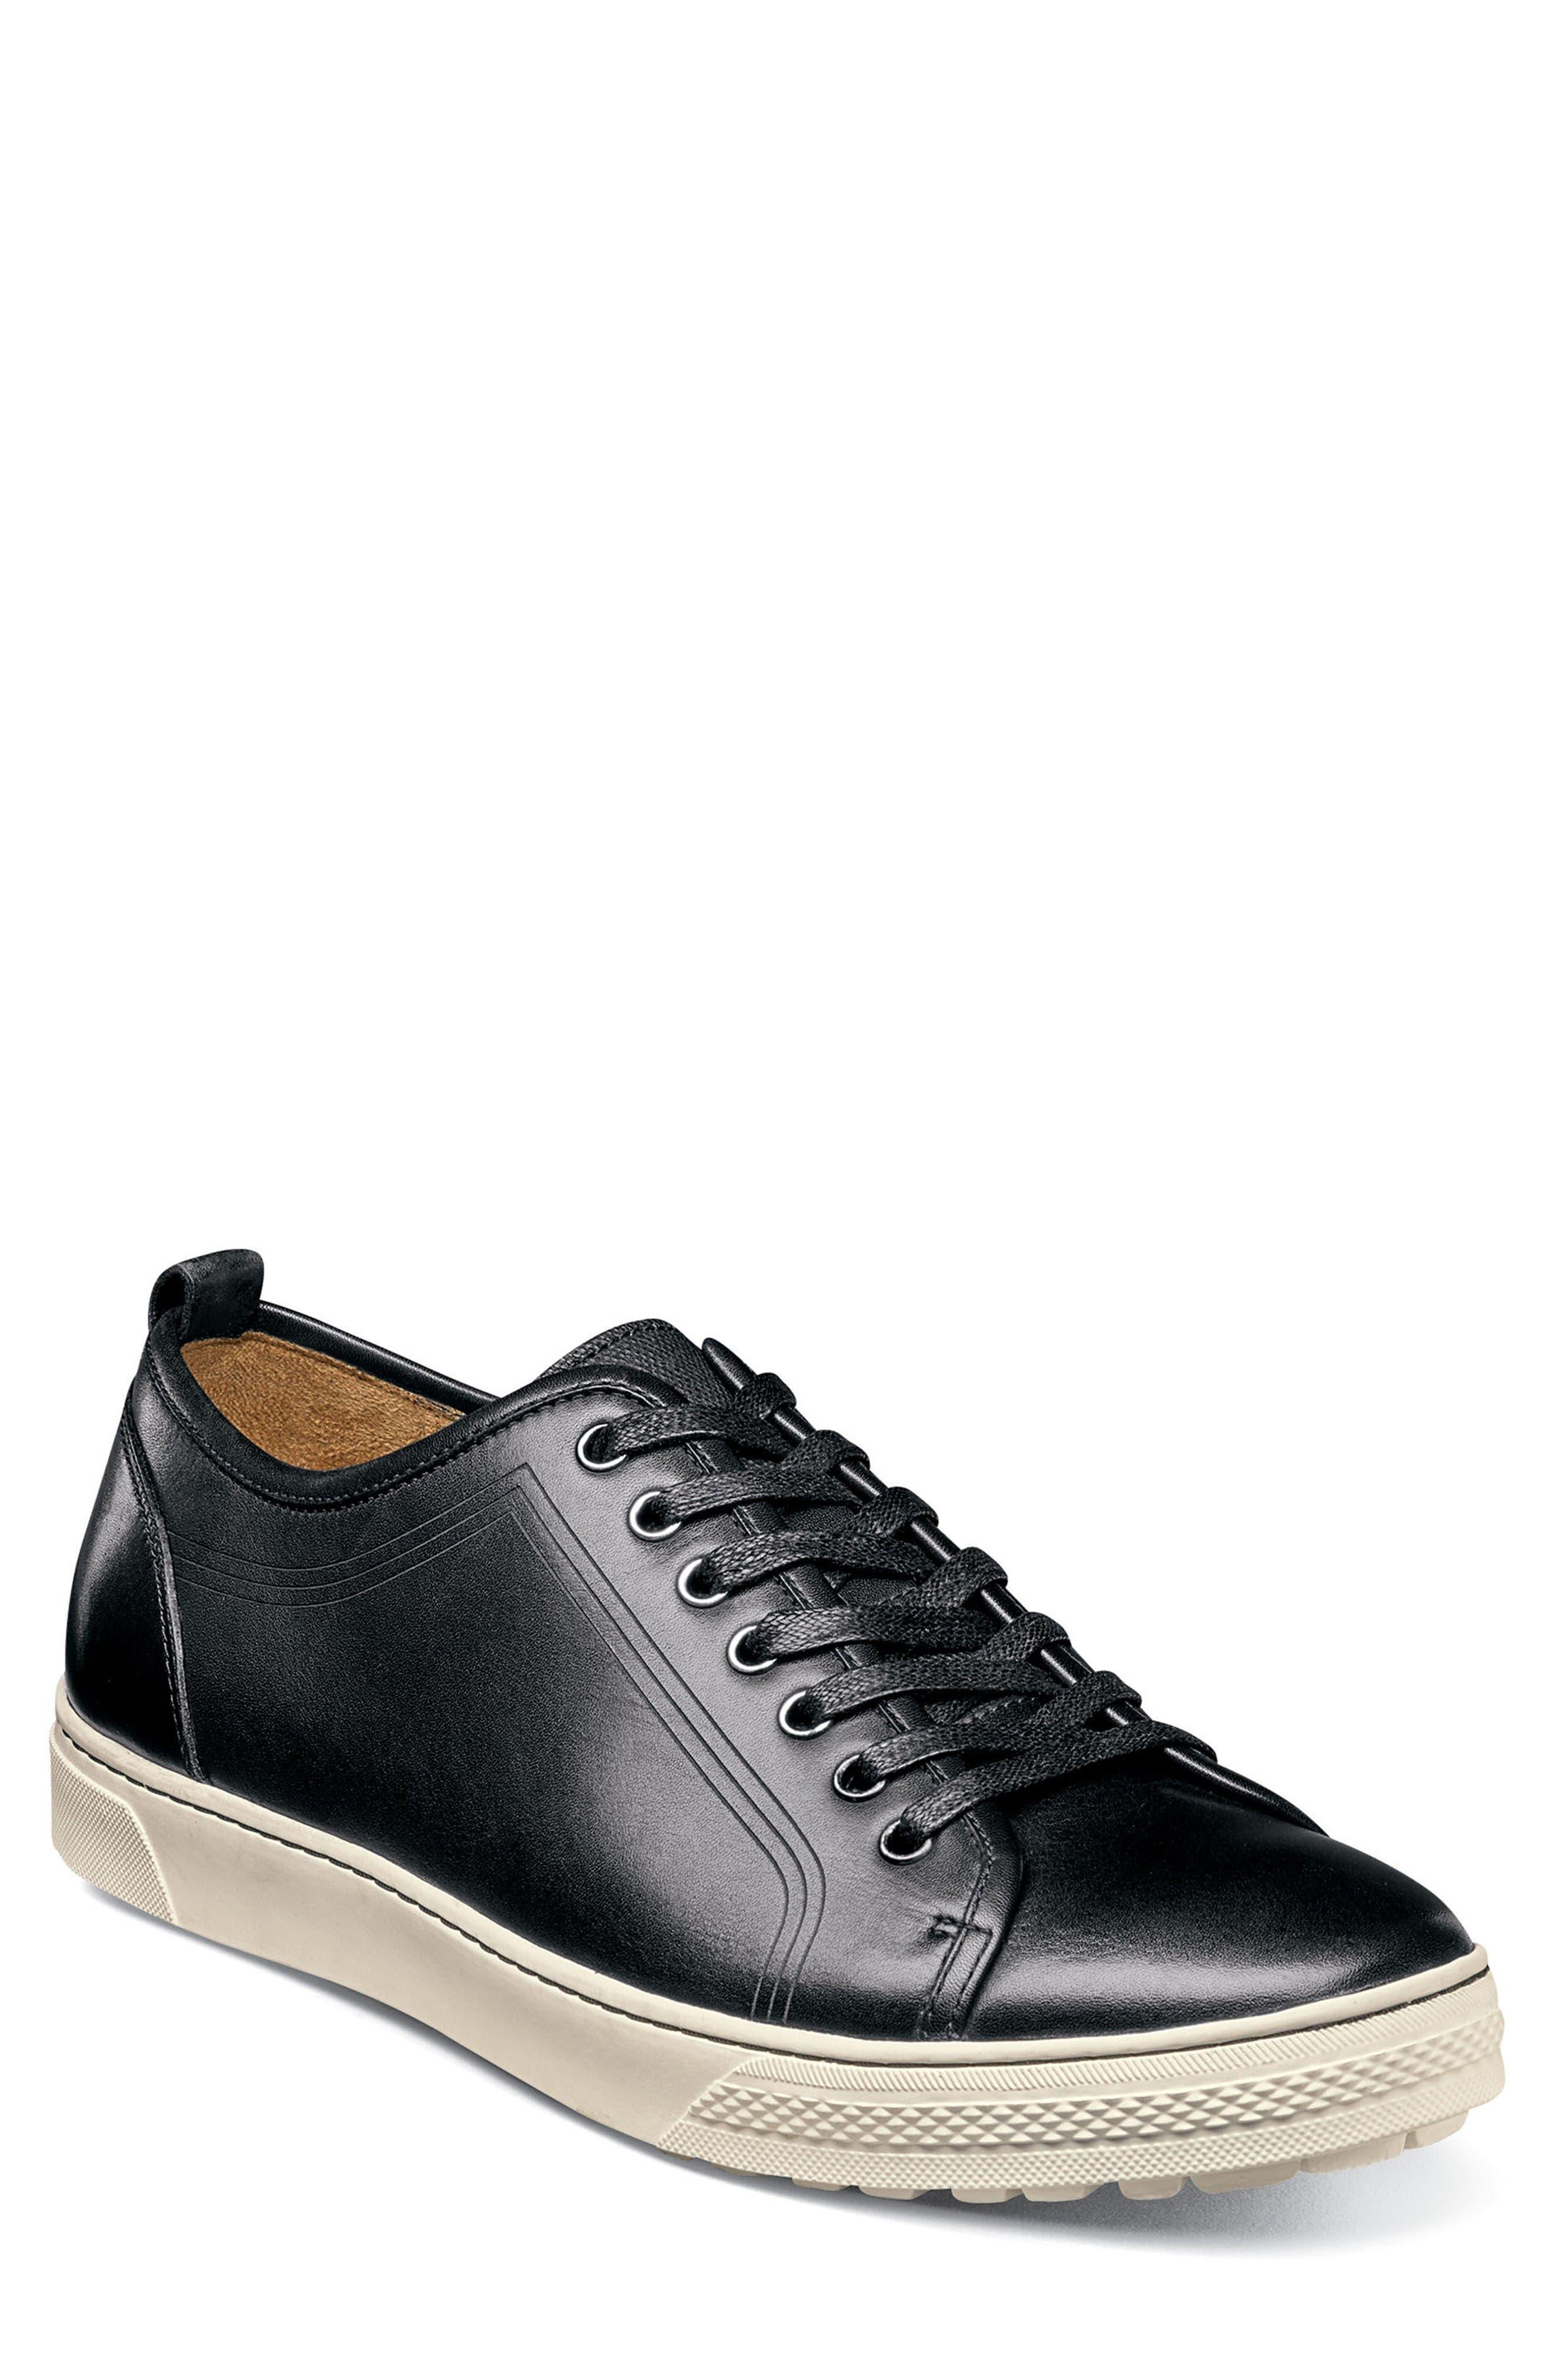 Forward Lo Sneaker,                         Main,                         color, Black/ White Leather